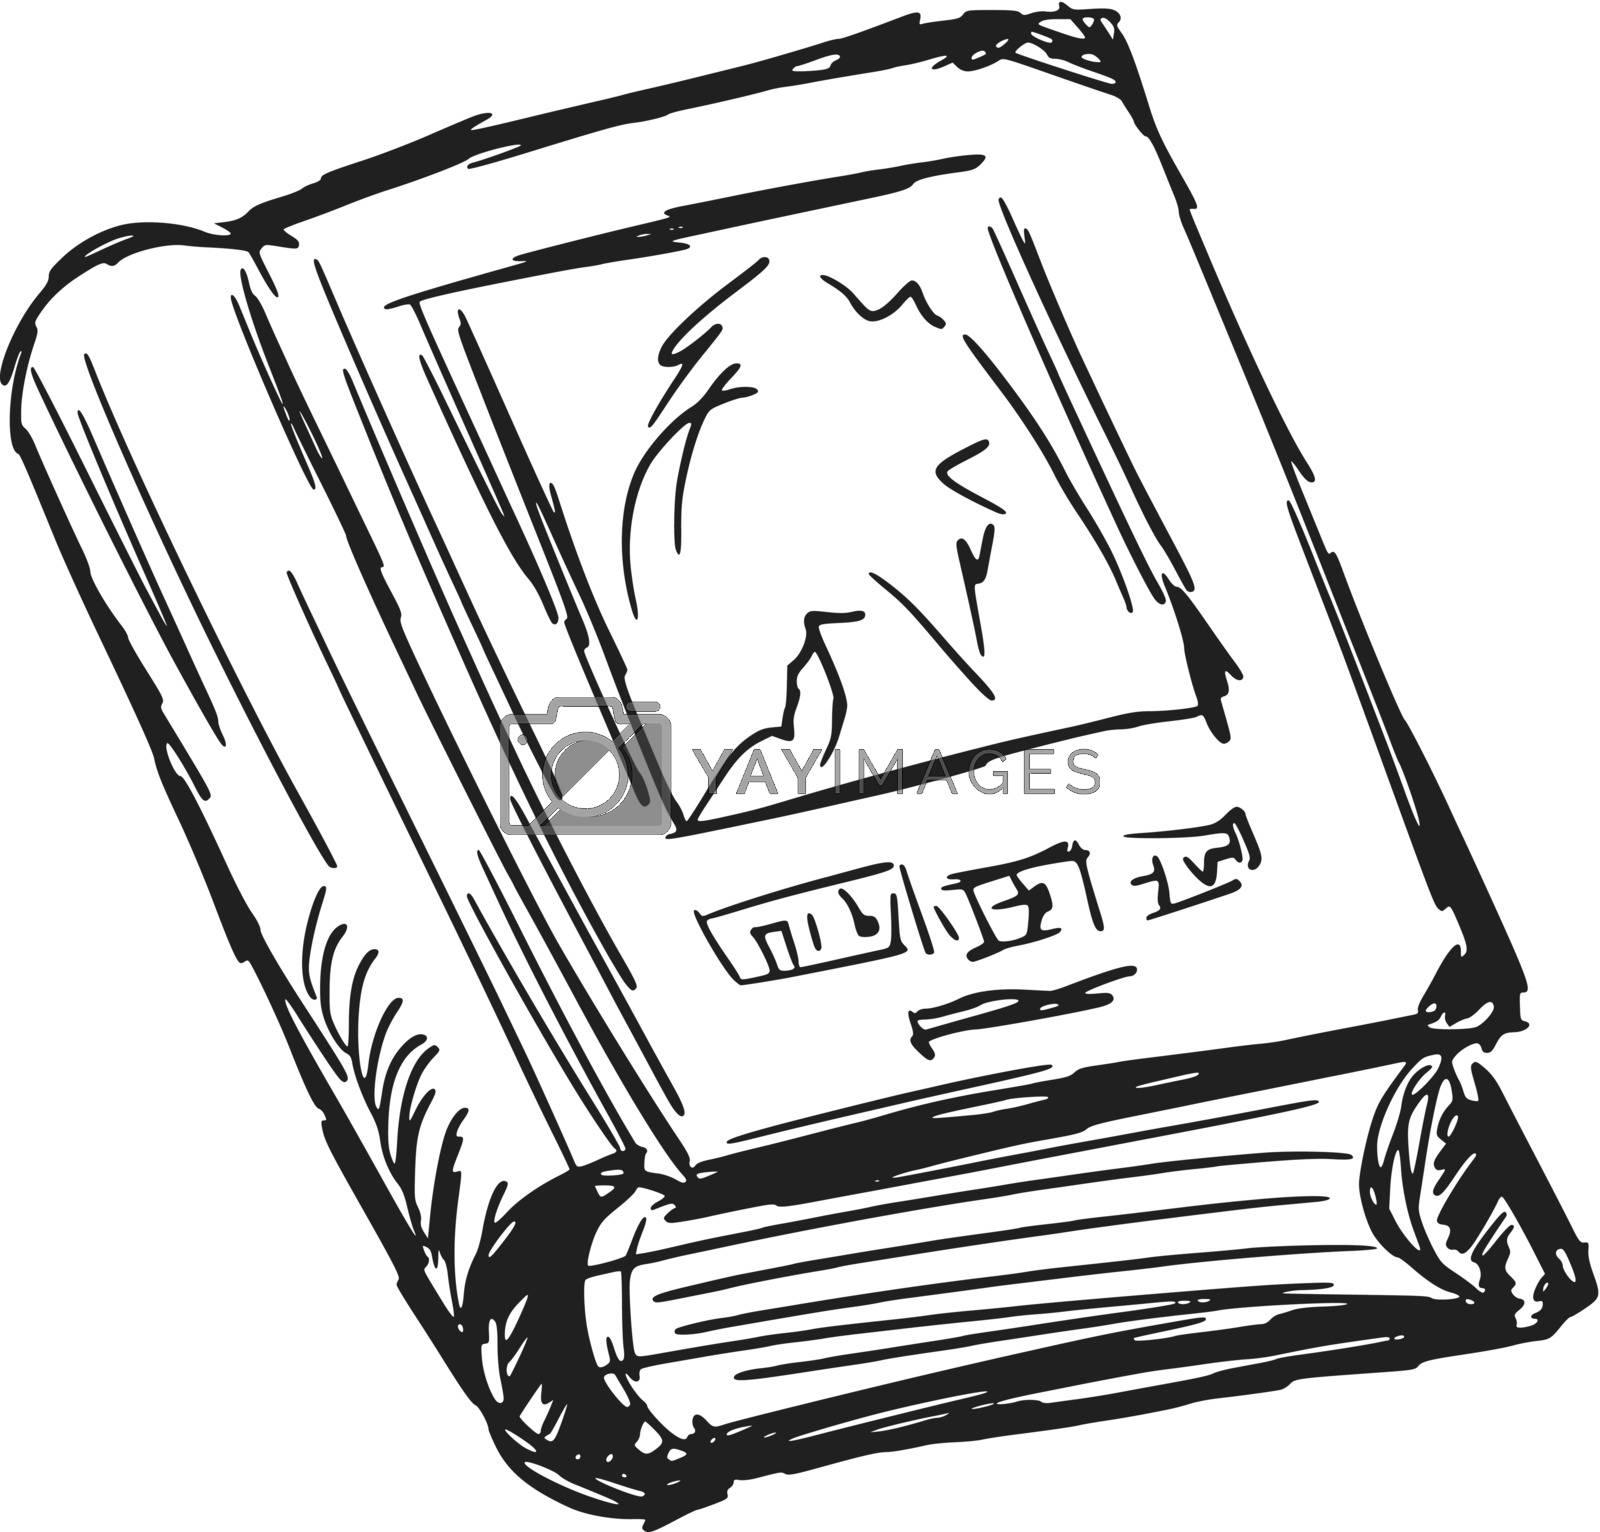 hand drawn, sketch, cartoon illustration of old book